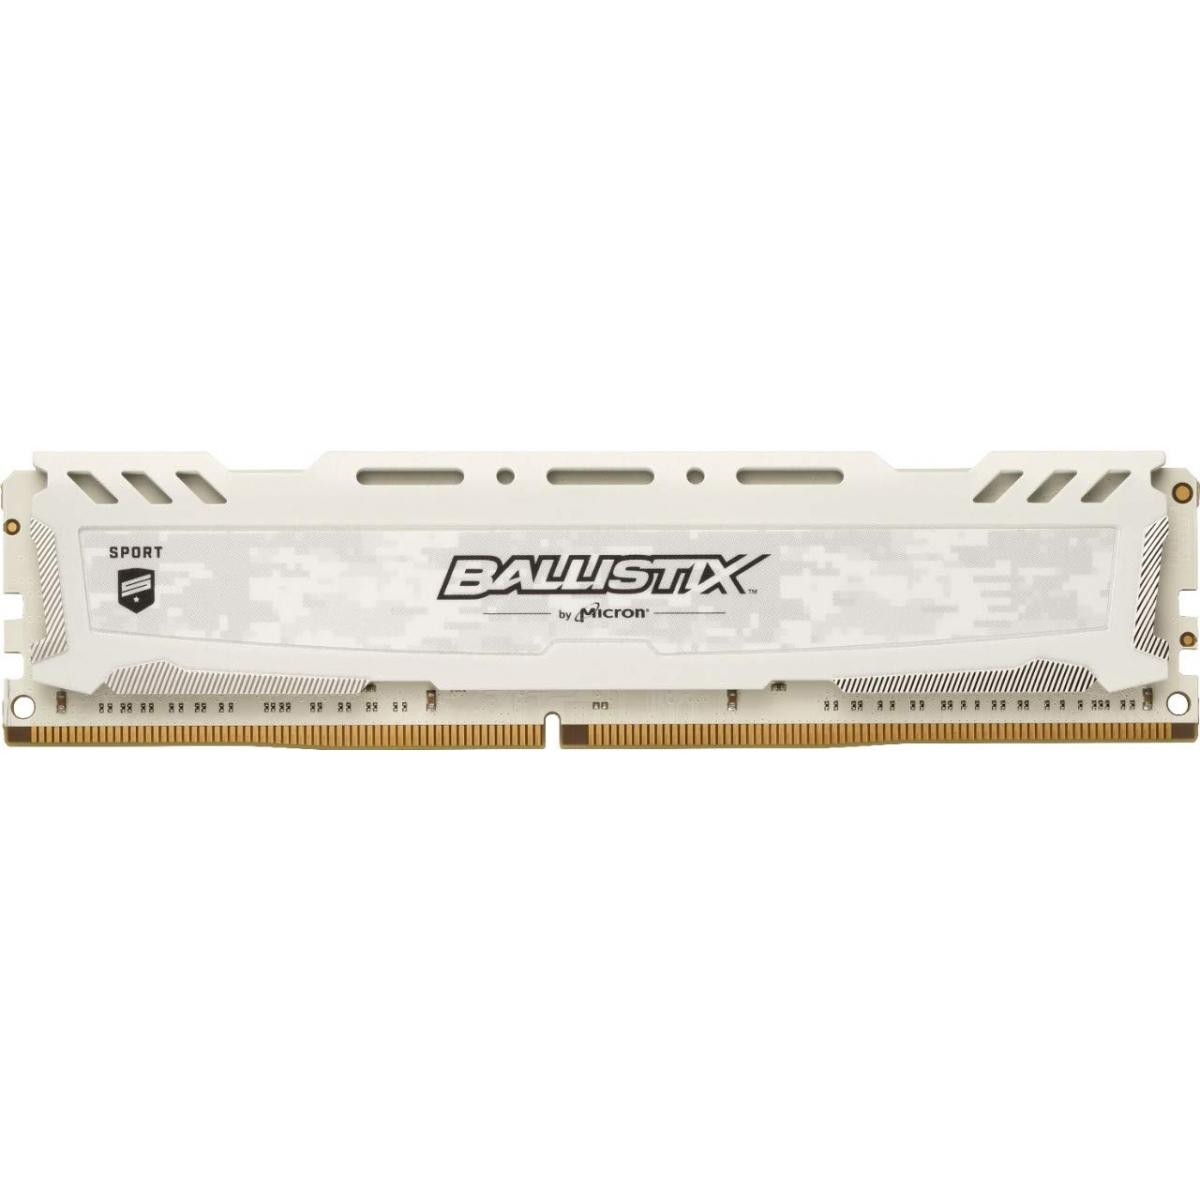 Memória DDR4 Crucial Ballistix Sport Lt, 16GB 3200MHz, White, BLS16G4D32AESC